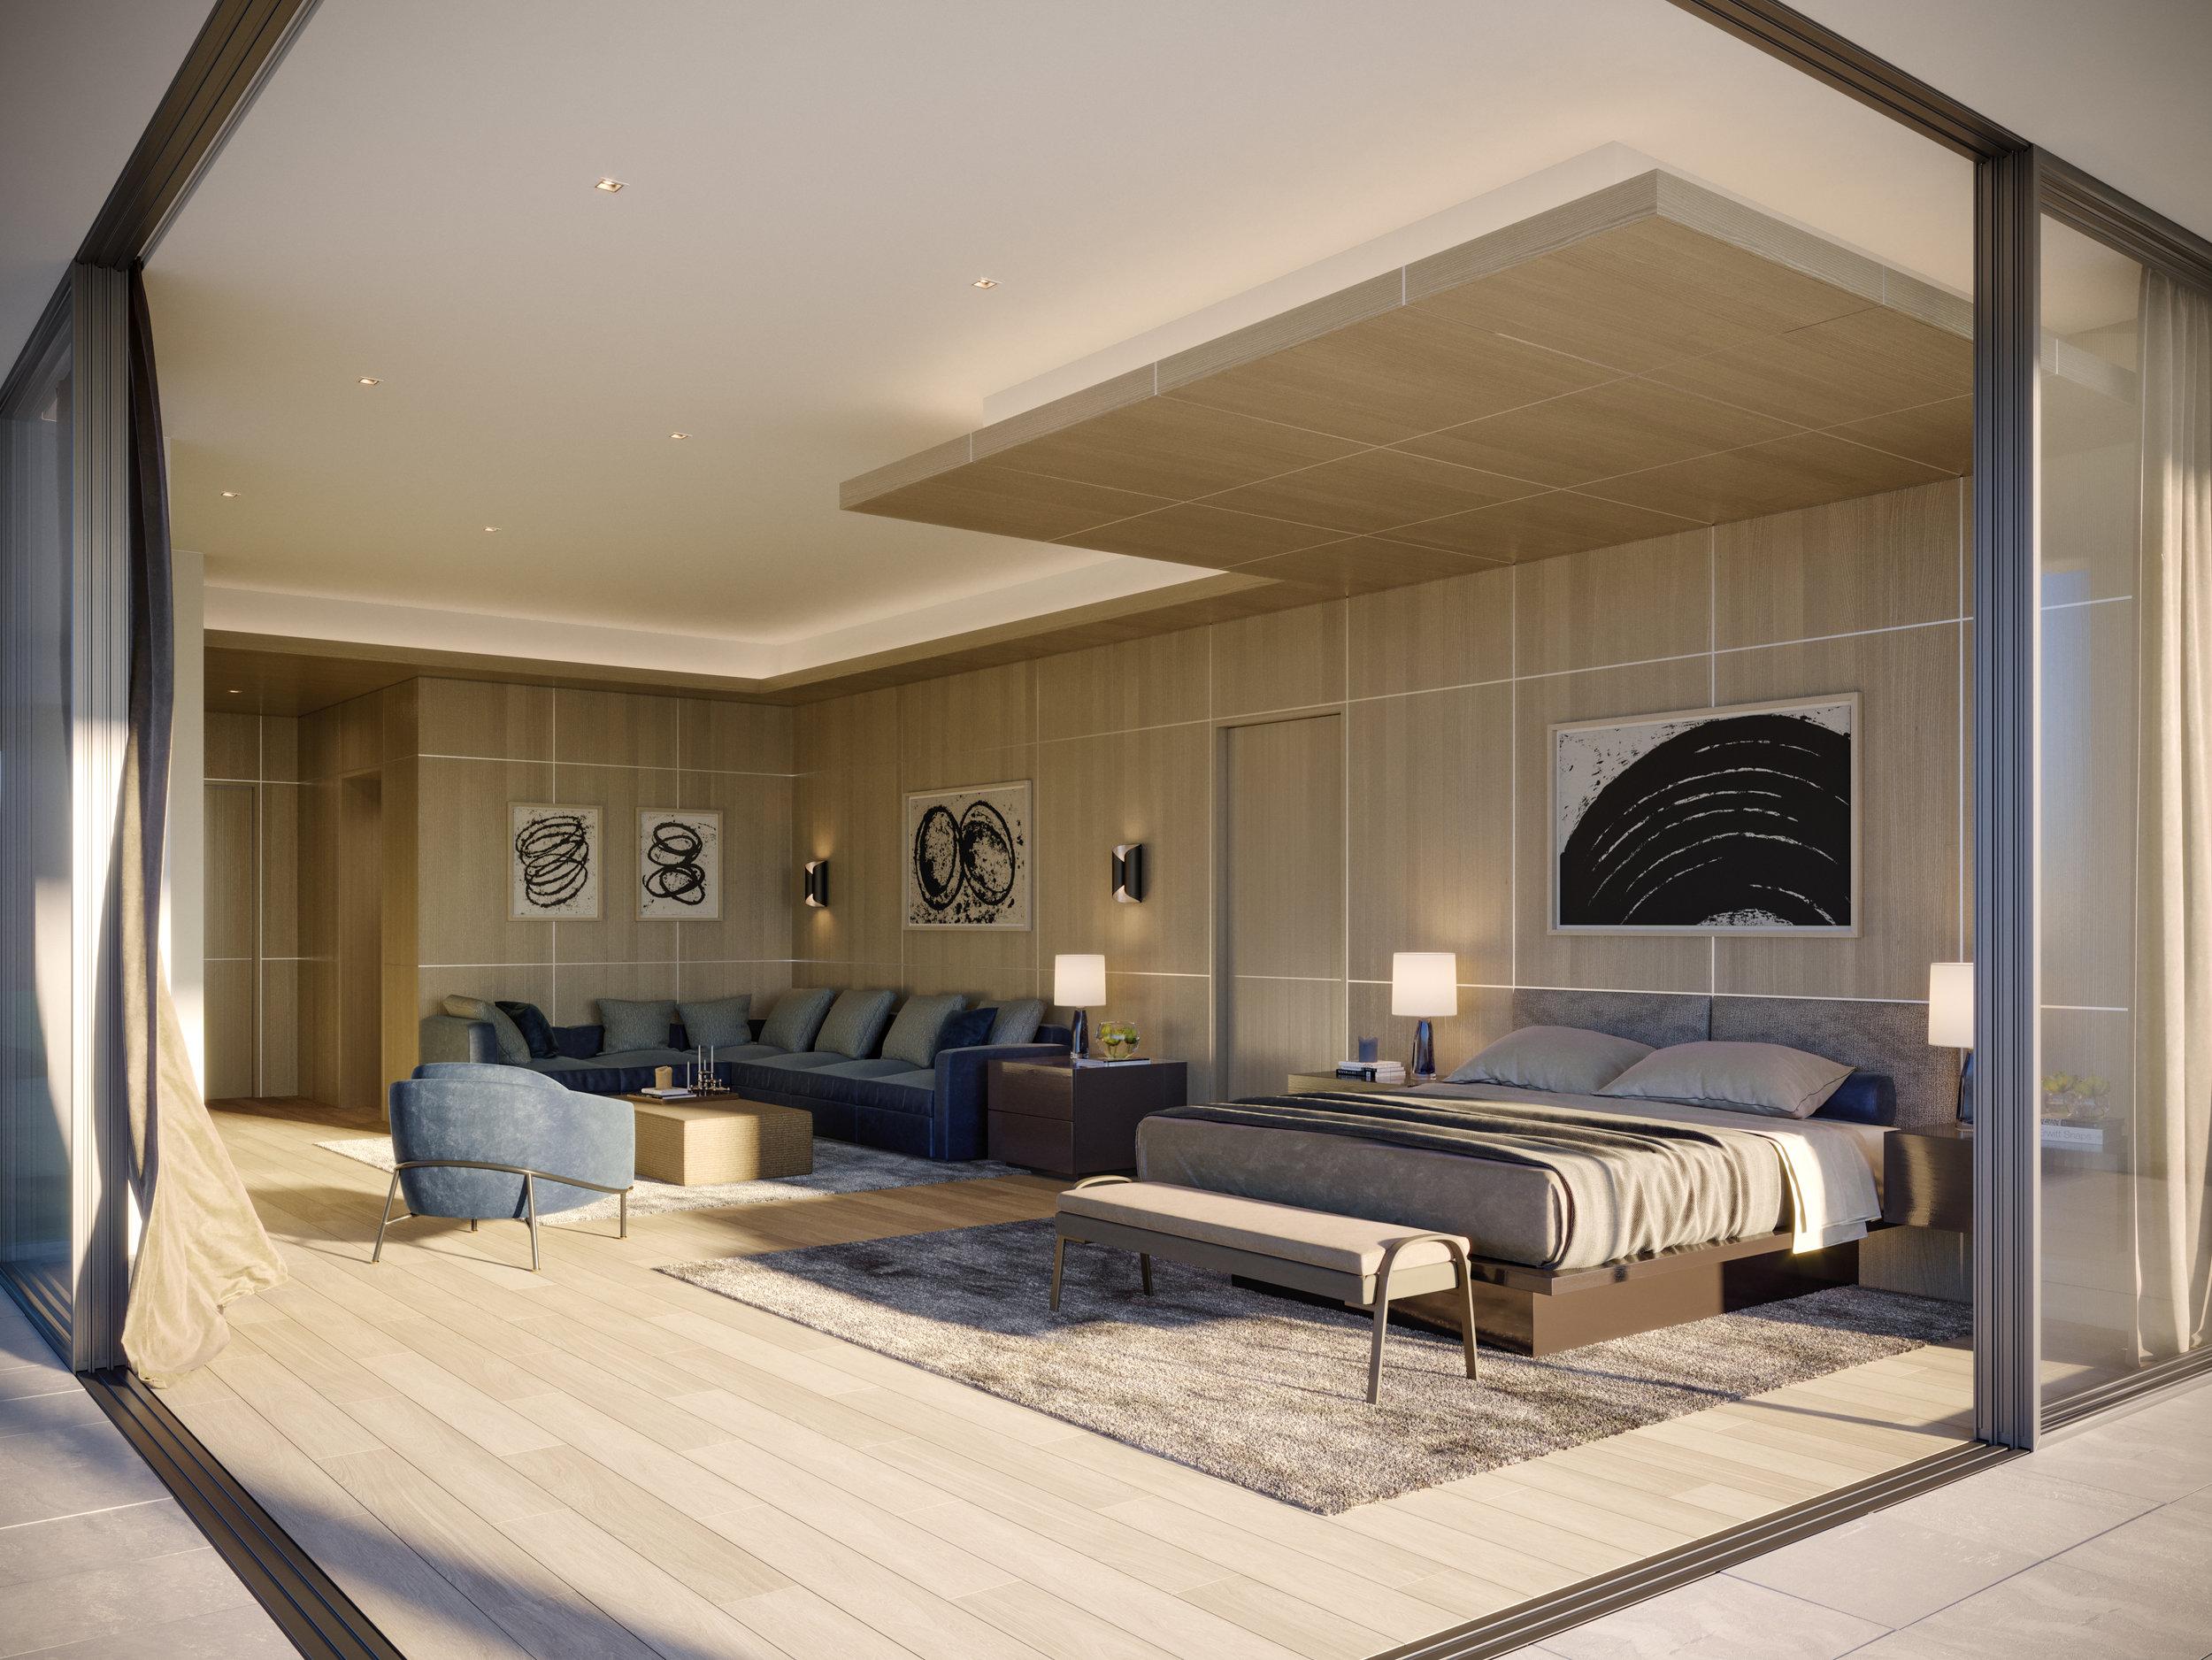 07-07-17_9105 Cordell_Master Bedroom_uncropped.jpg